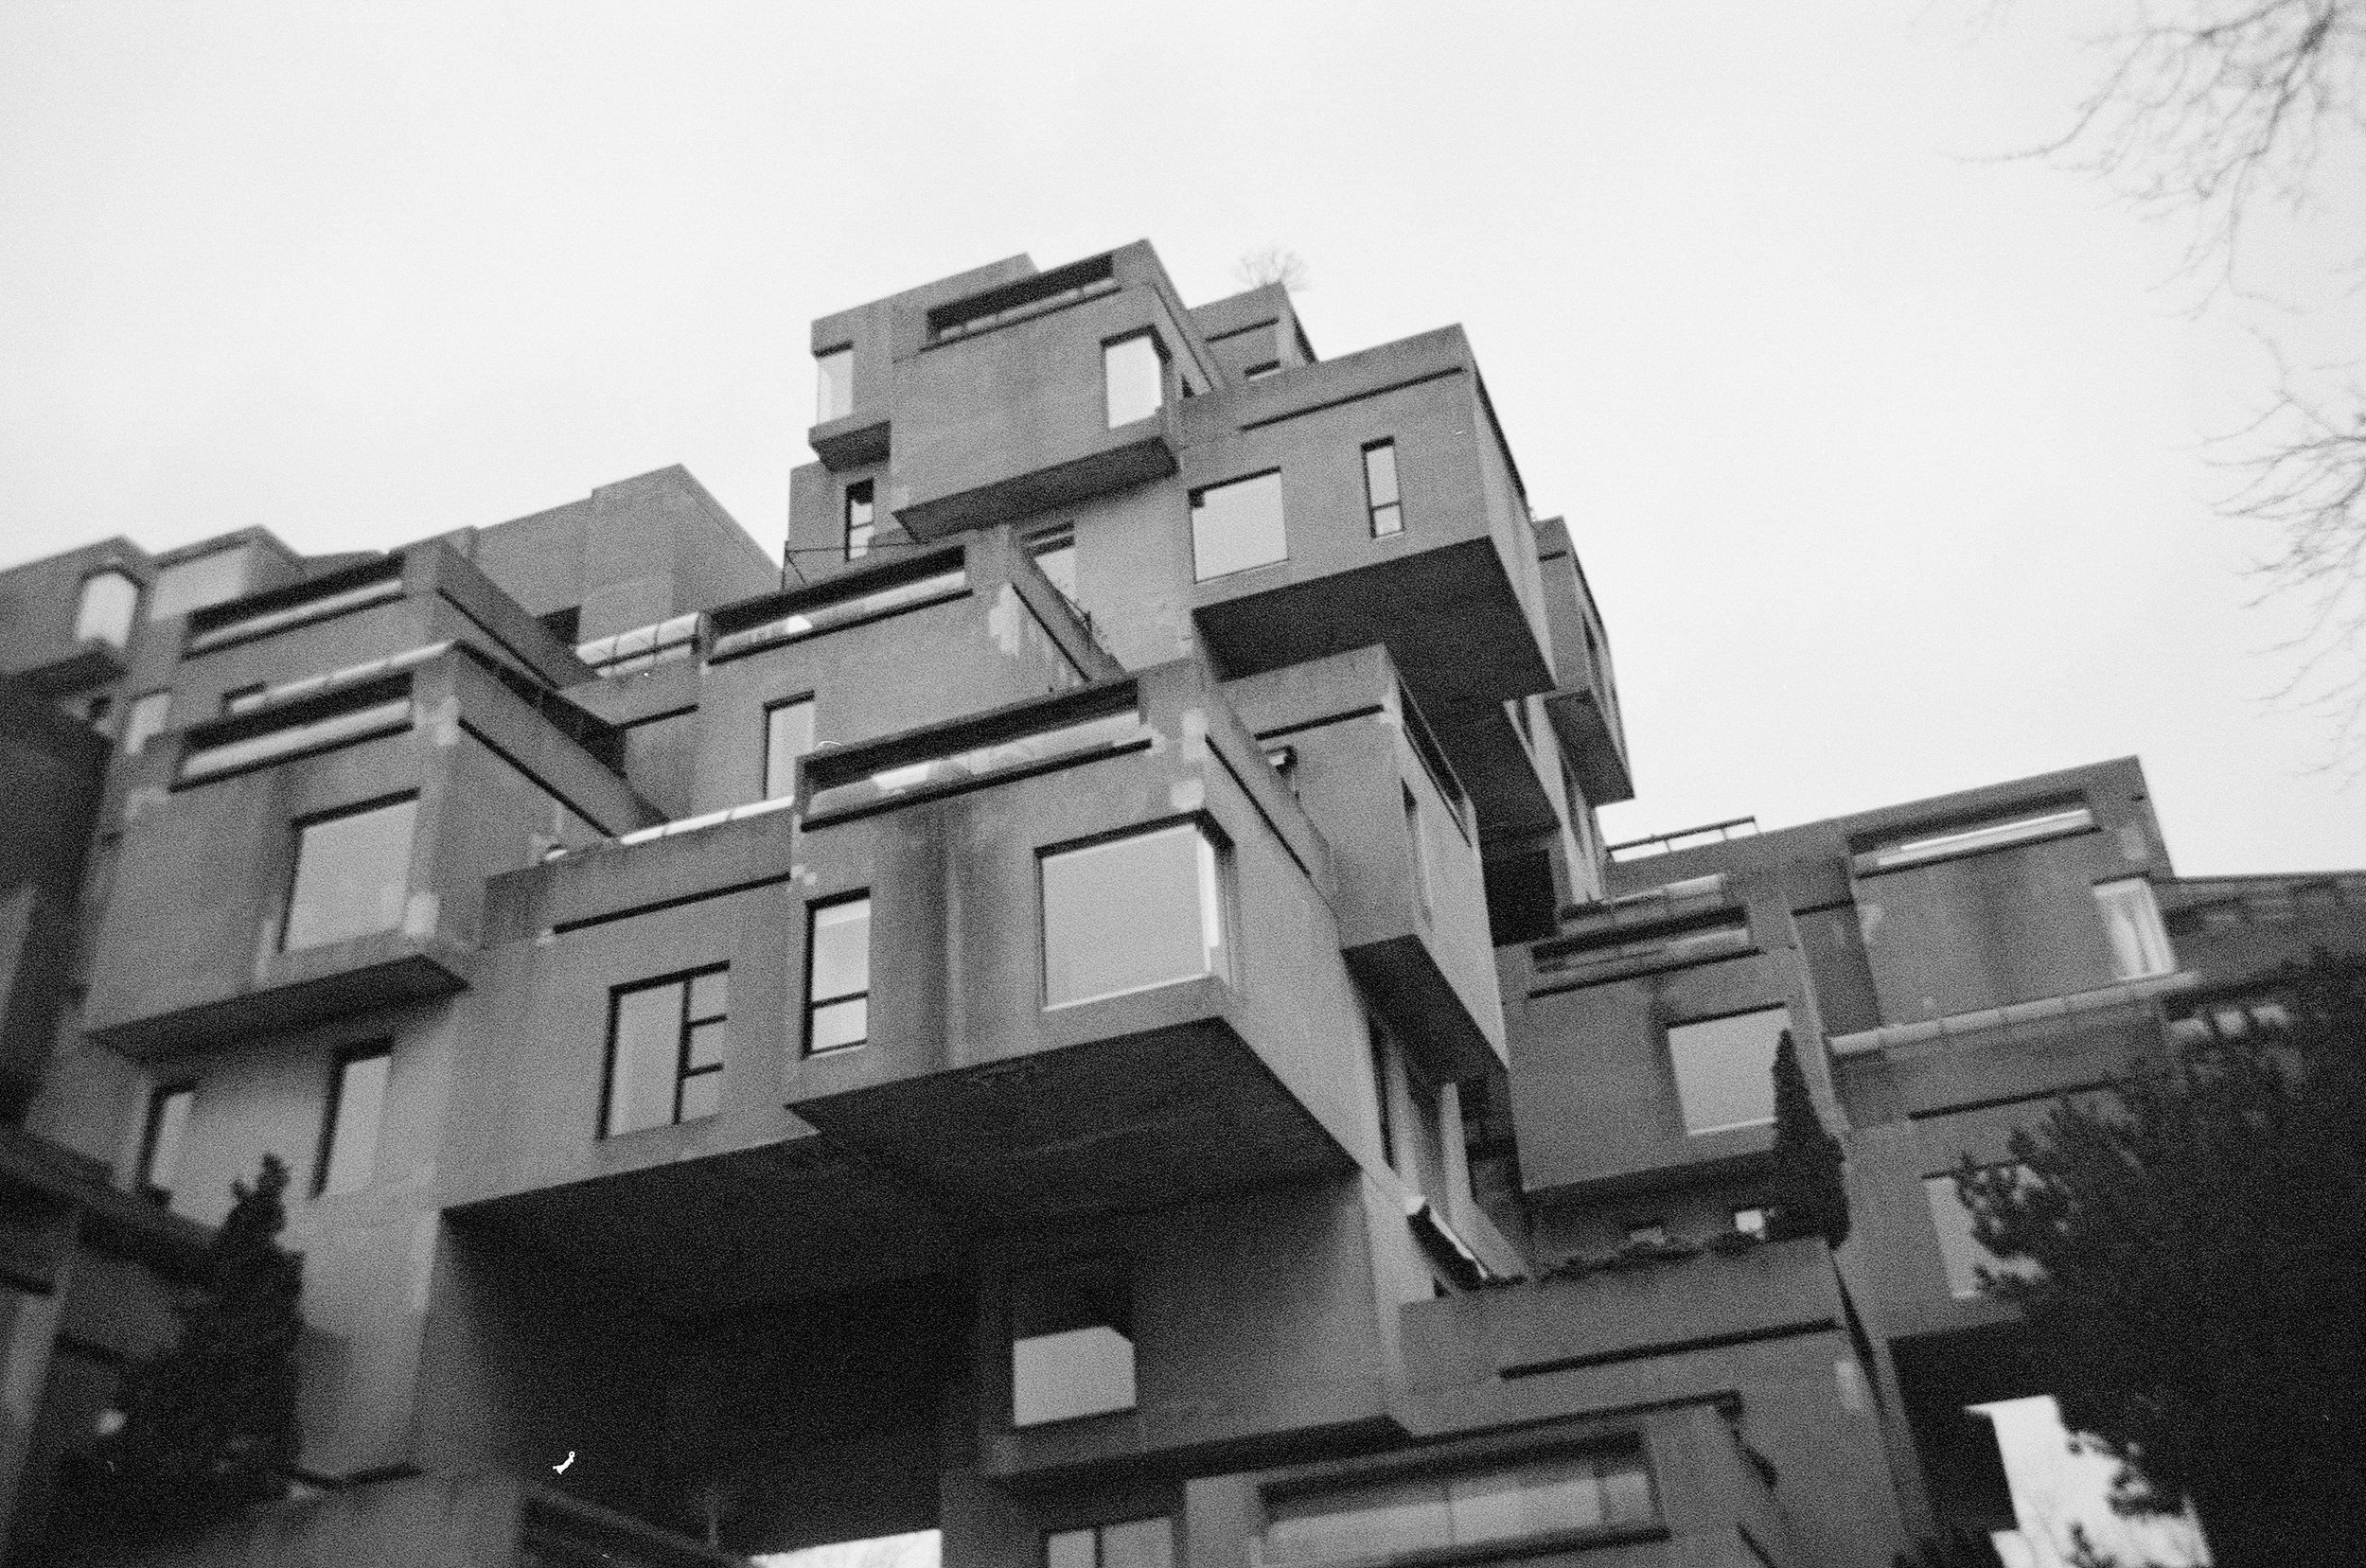 Habitat '67 - Ilford XP2